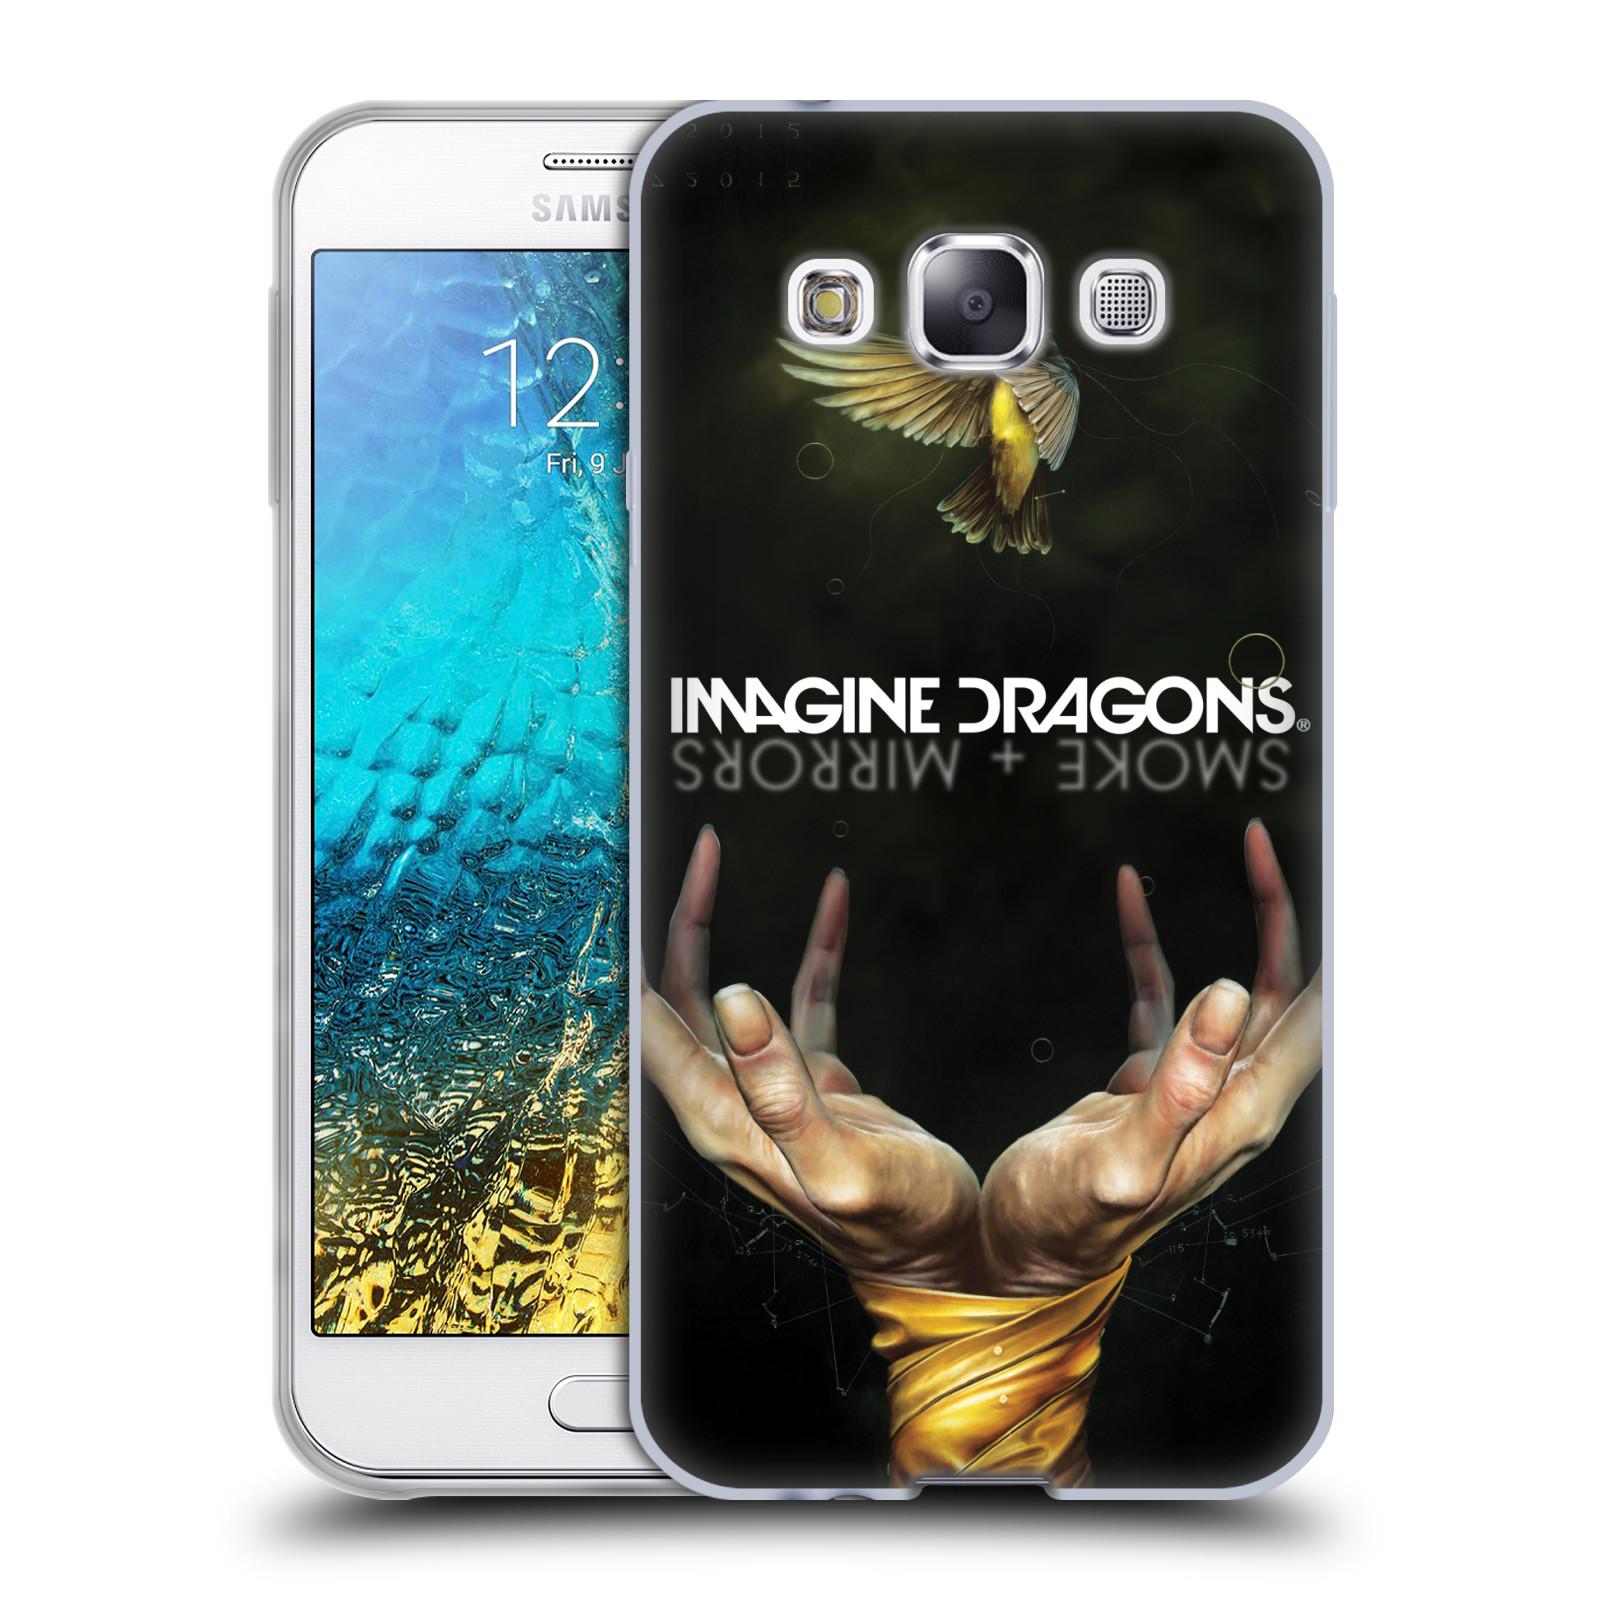 HEAD CASE silikonový obal na mobil Samsung Galaxy E5 hudební skupina Imagine Dragons SMOKE and MIRRORS